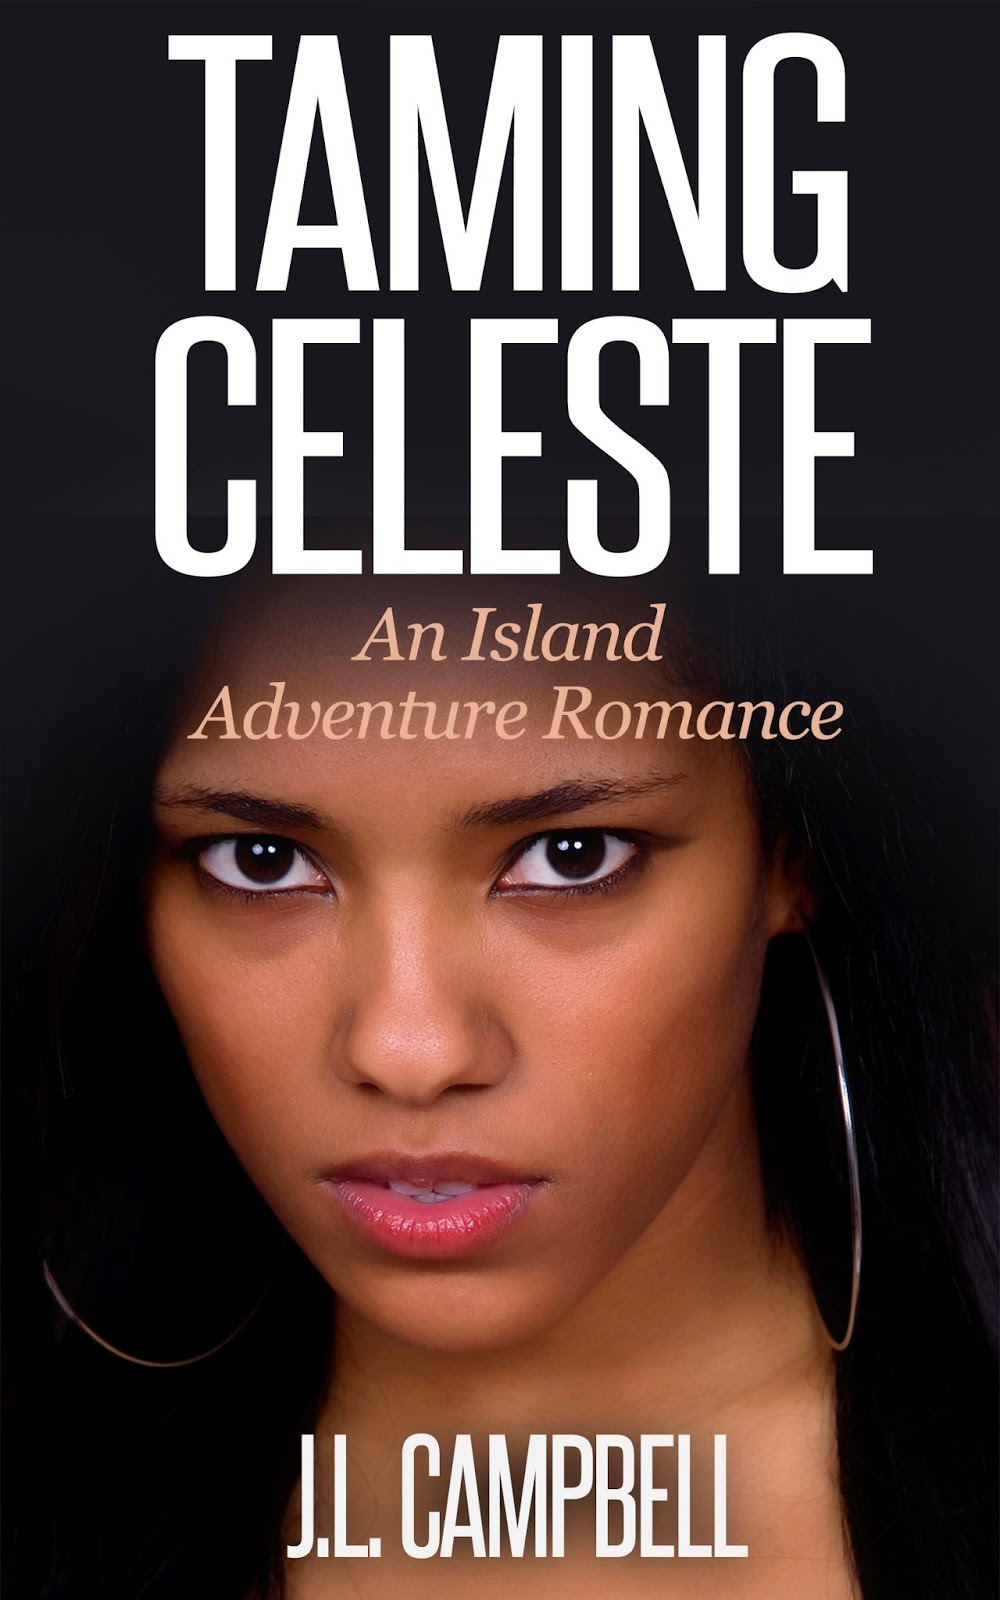 http://www.amazon.com/Taming-Celeste-Island-Adventure-Romance-ebook/dp/B00LCPRY7E/ref=sr_1_1?s=books&ie=UTF8&qid=1414373236&sr=1-1&keywords=Taming+Celeste